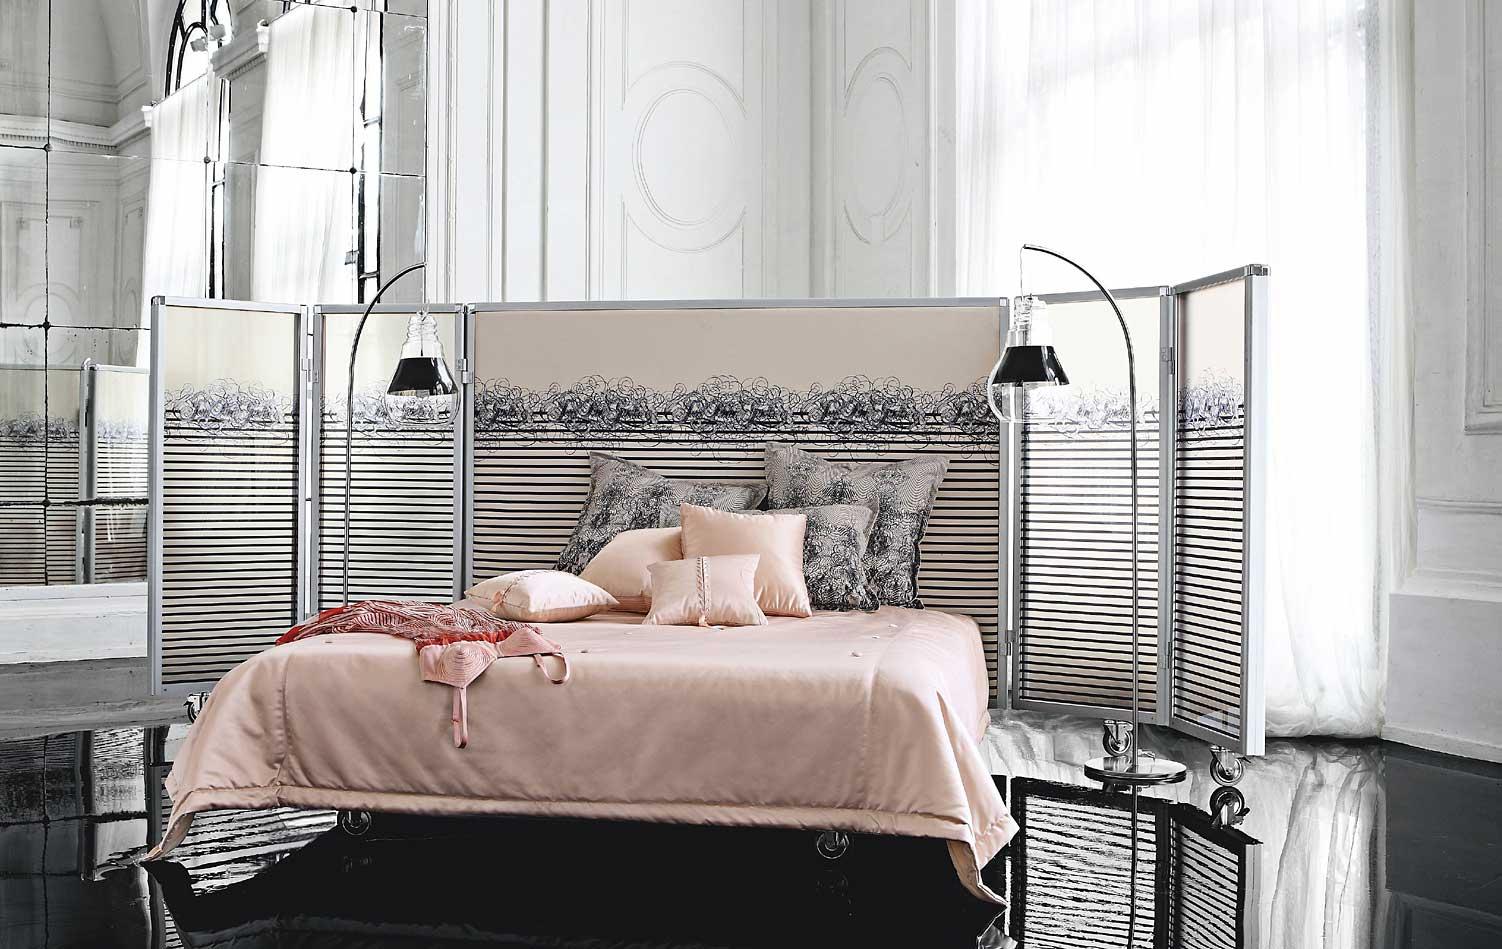 Roche-Bobois-Bedrooms-13